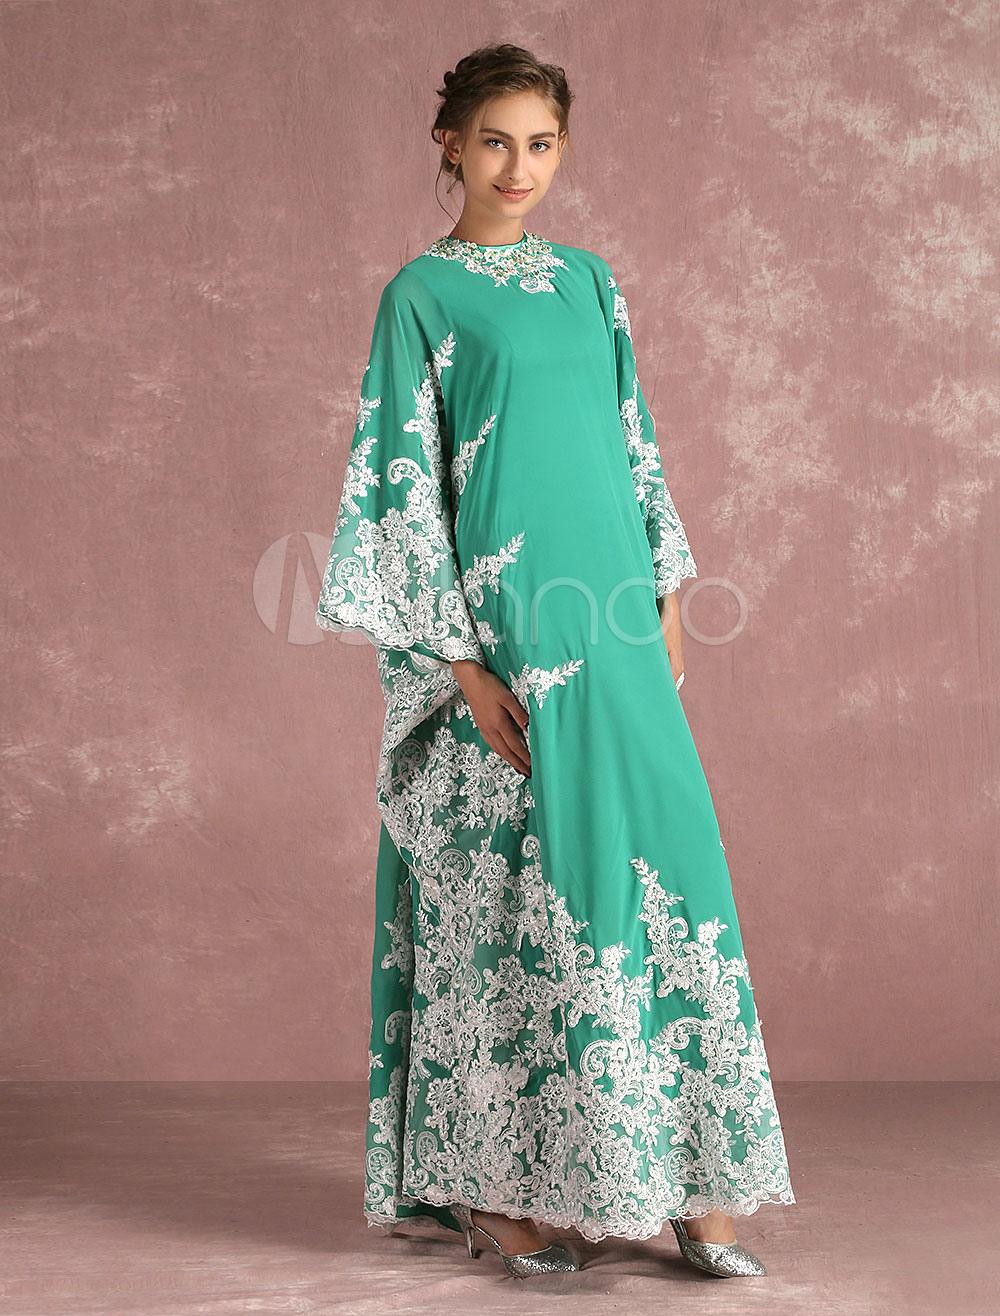 Muslim Evening Dress Lace Applique 2 Piece Mother's Dress Floor Length Occasion Dress In Blue Green